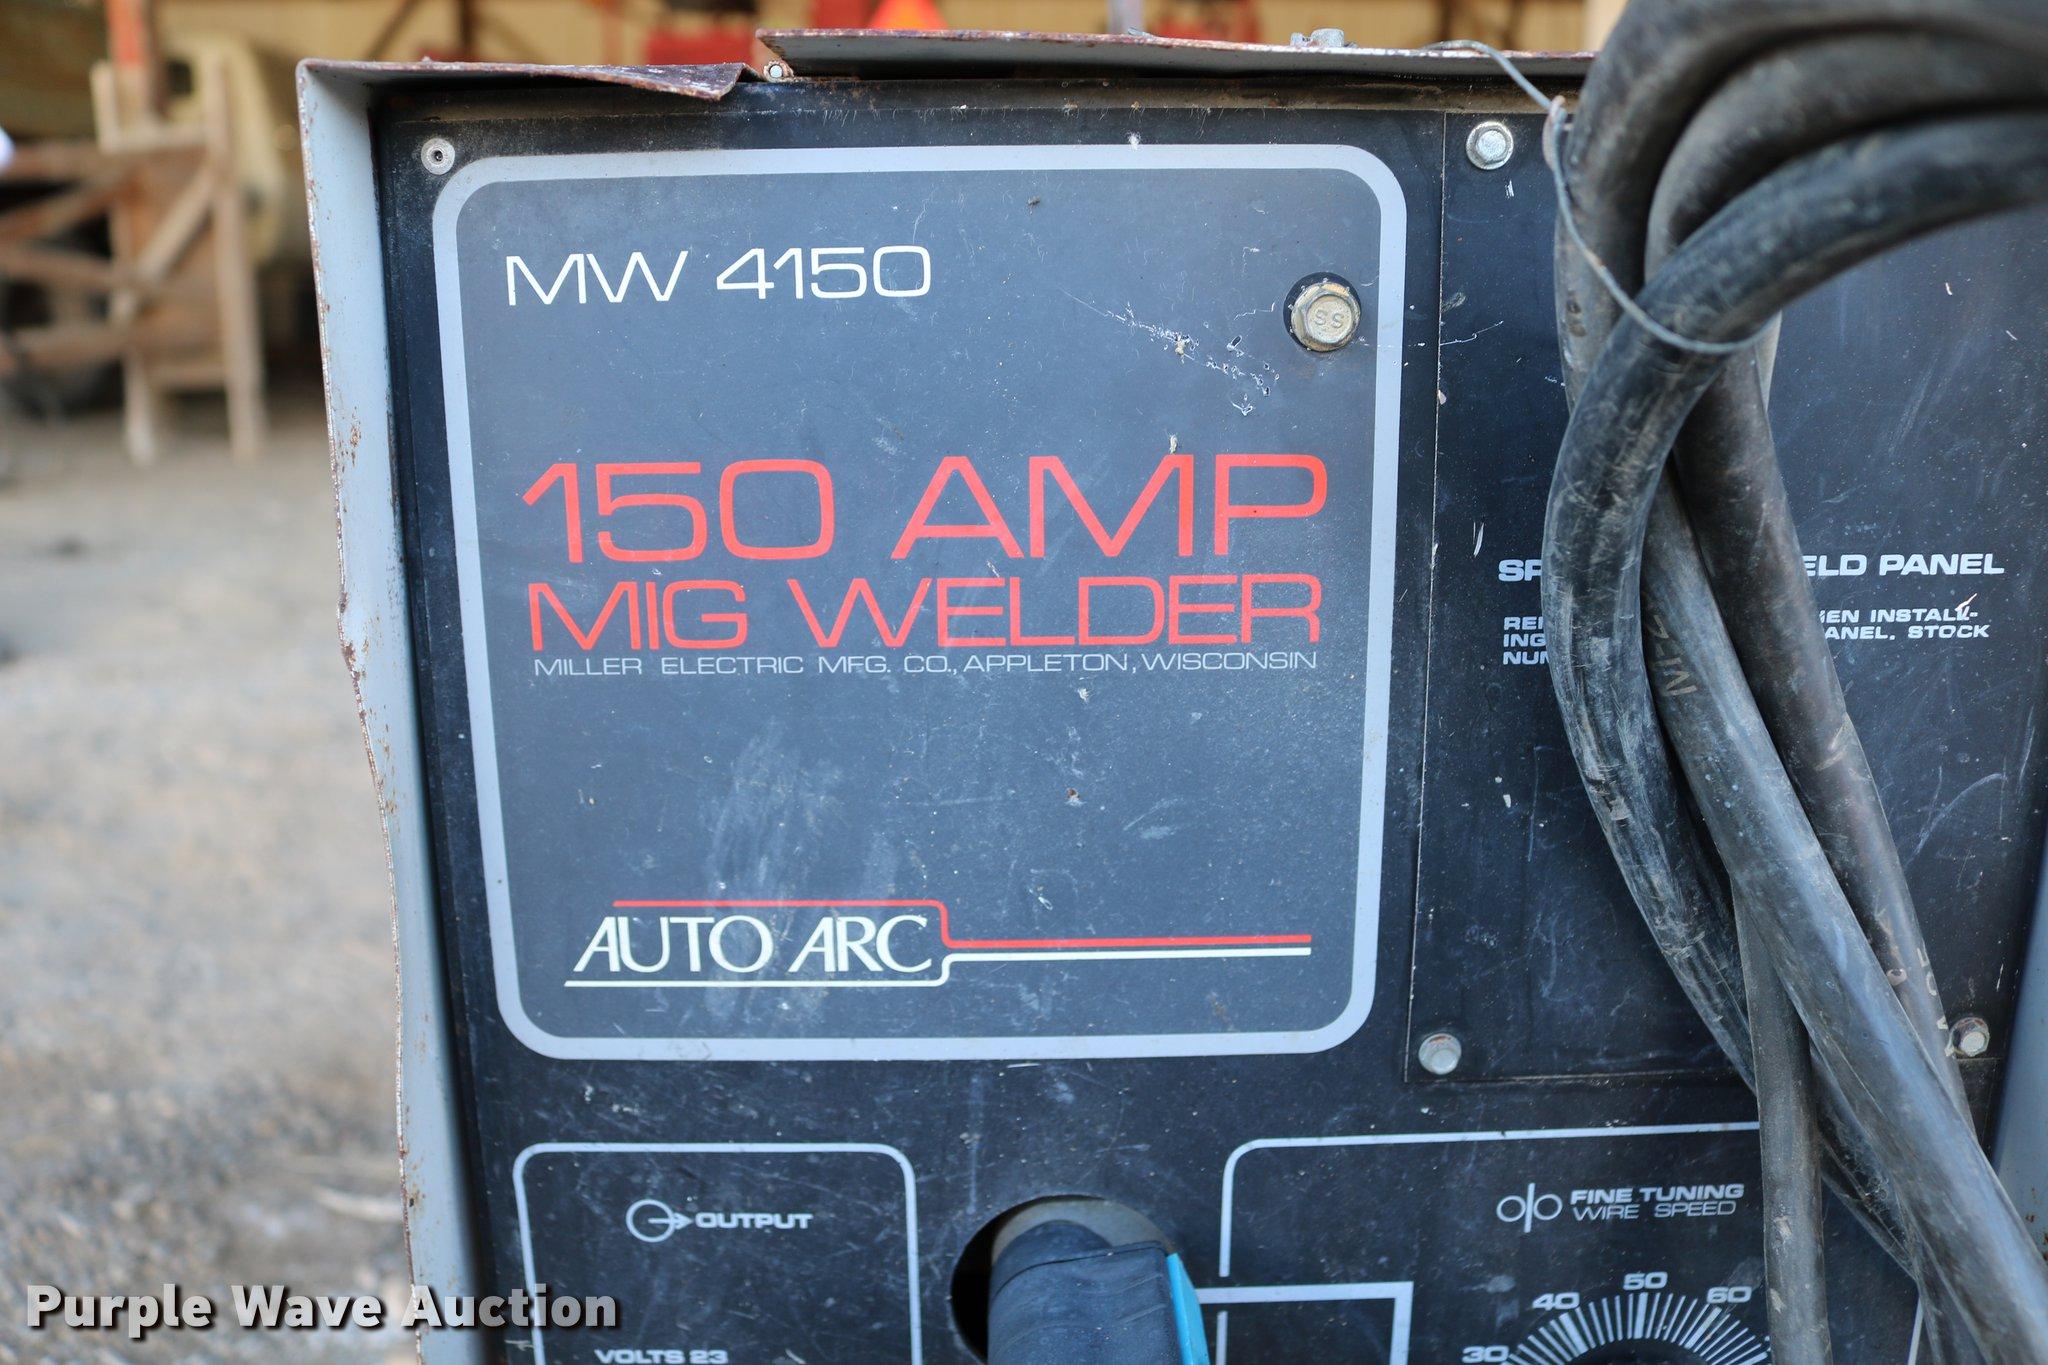 Auto Arc MW450 mig welder | Item EW9011 | SOLD! April 3 Gove...